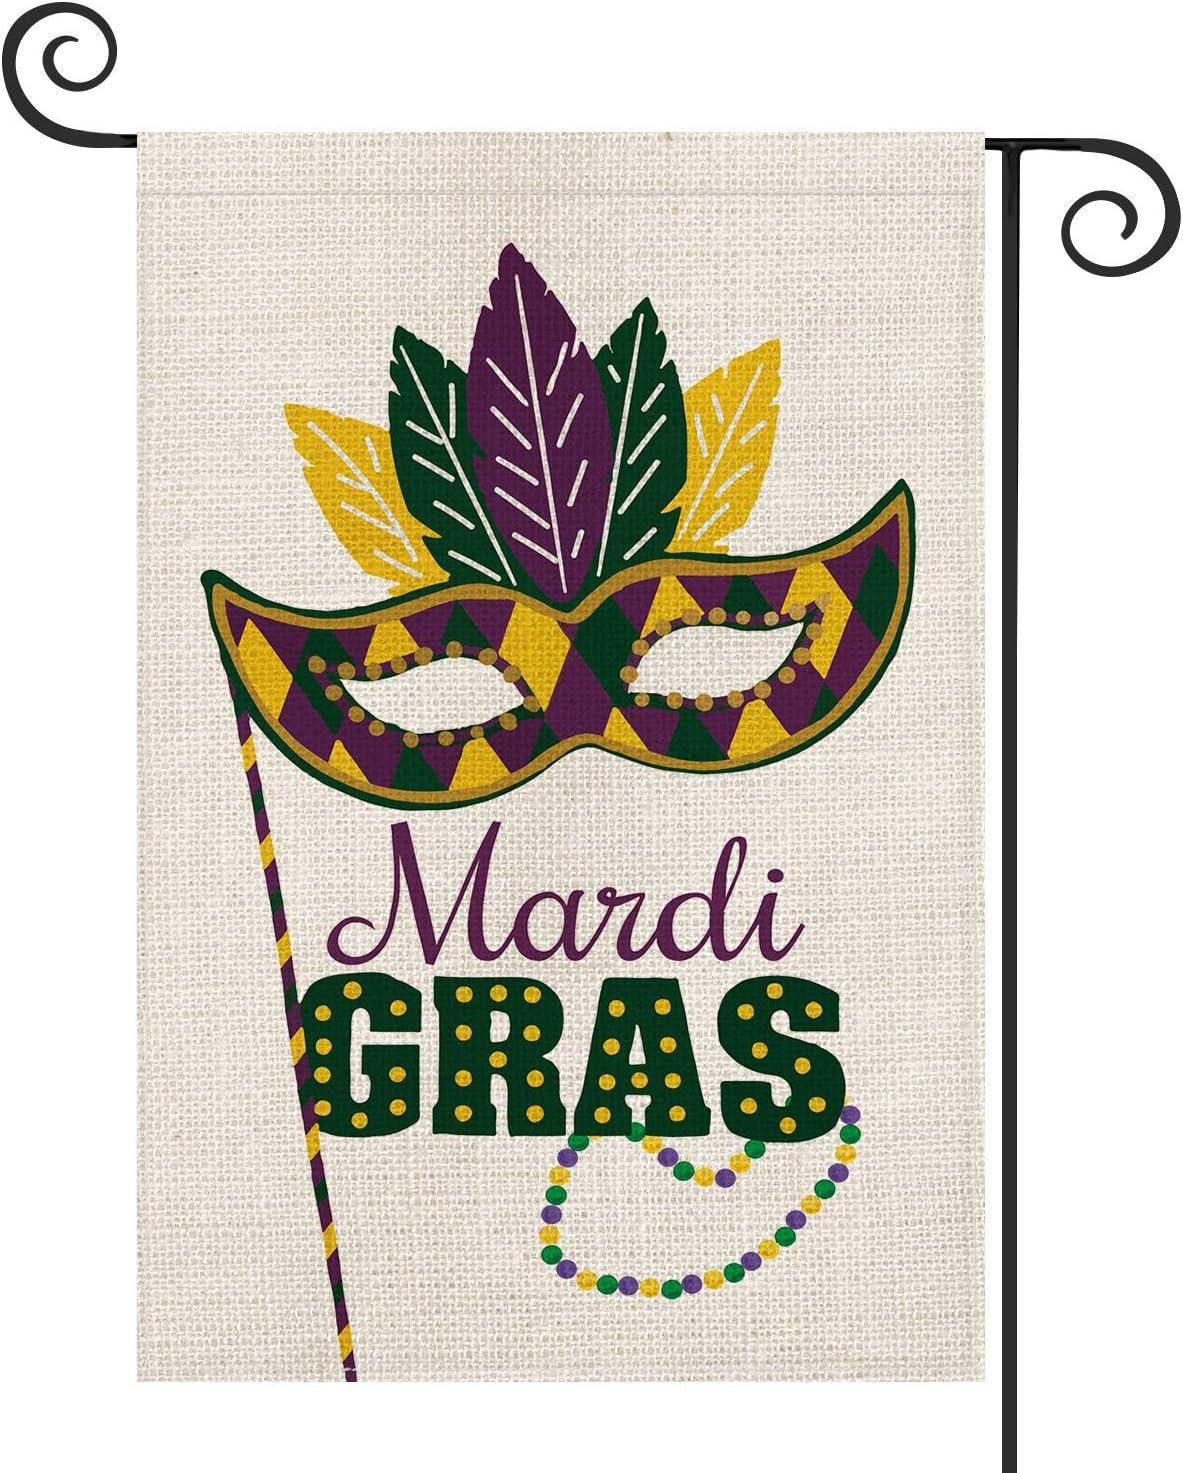 AVOIN Mardi Gras Masquerade Mask Garden Flag Vertical Double Sized, Holiday Party Mardi Gras Bead Yard Outdoor Decoration 12.5 x 18 Inch